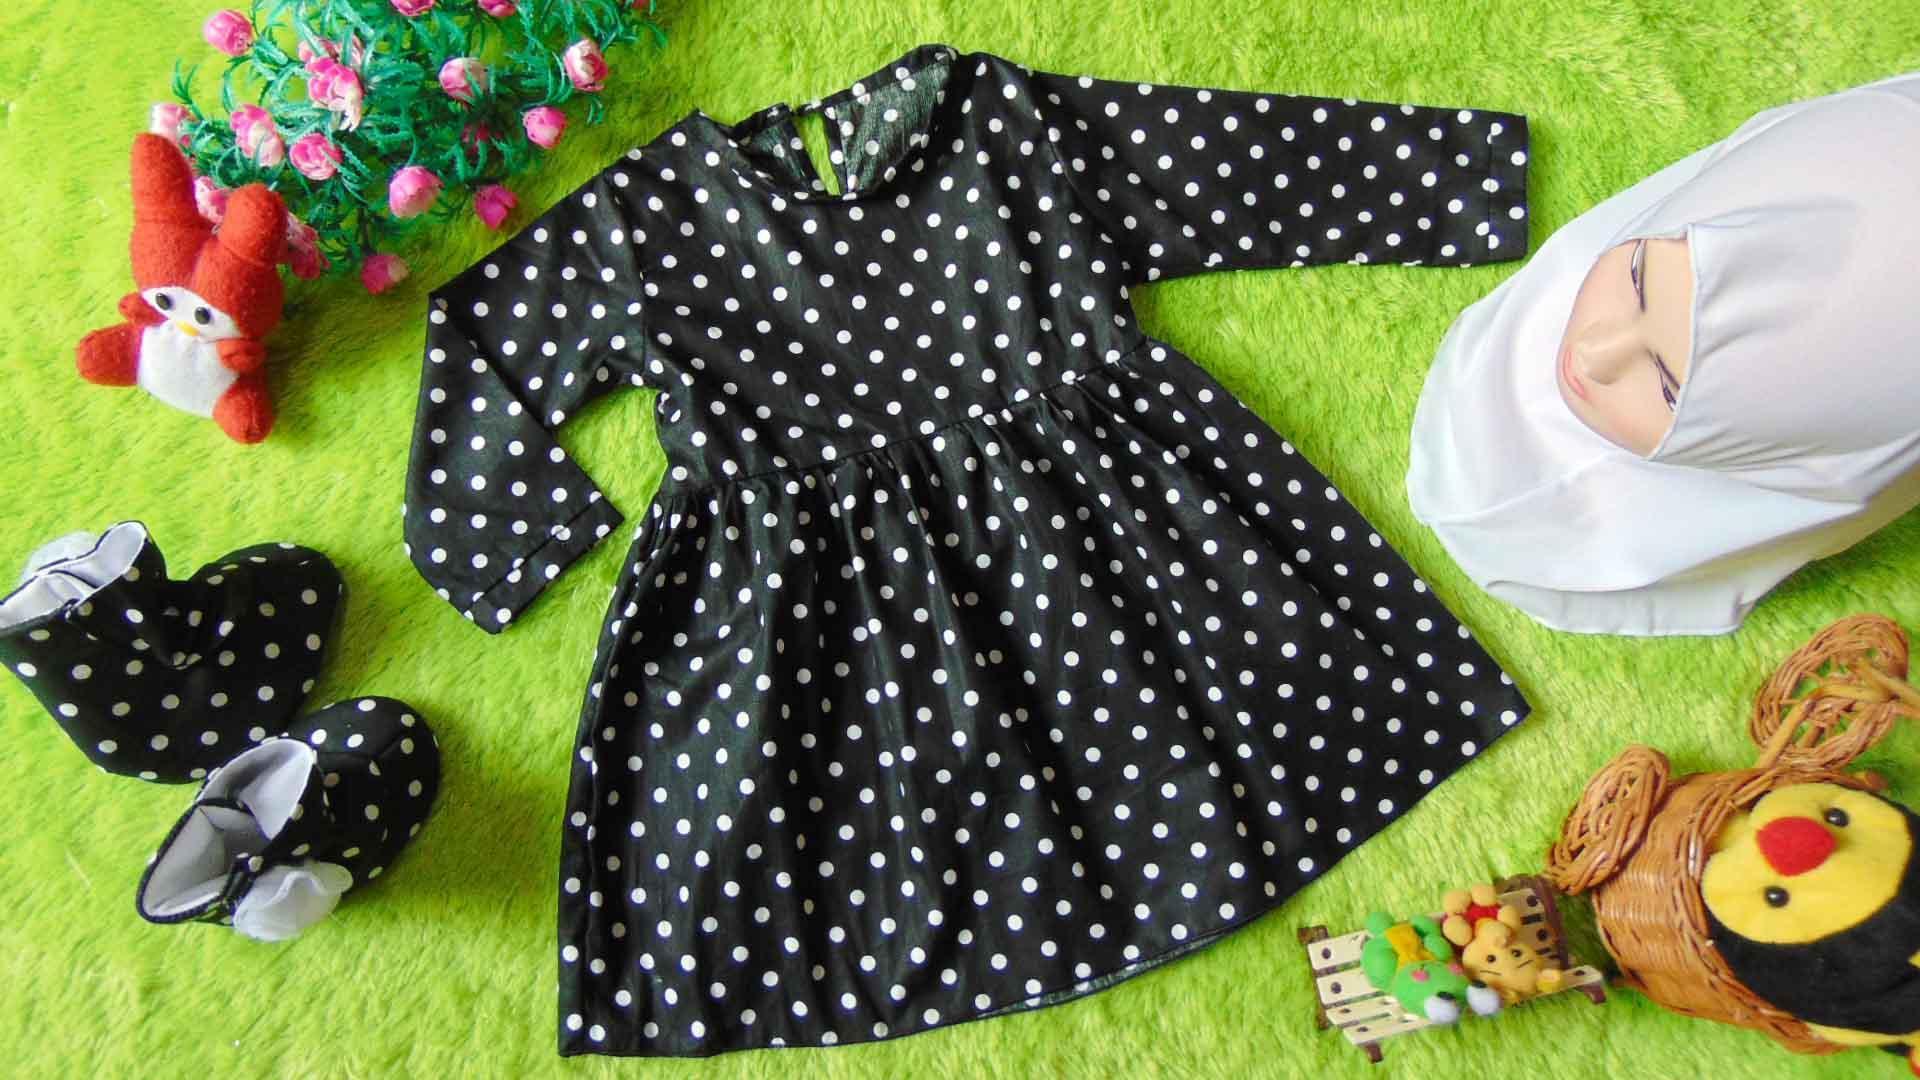 kembarshop - EKSKLUSIF Kado Bayi Paket Gamis Baju Muslim Anak Bayi Perempuan plus Jilbab dan Sepatu Boots Bayi Polka Hitam Cantik 0-12 bulan